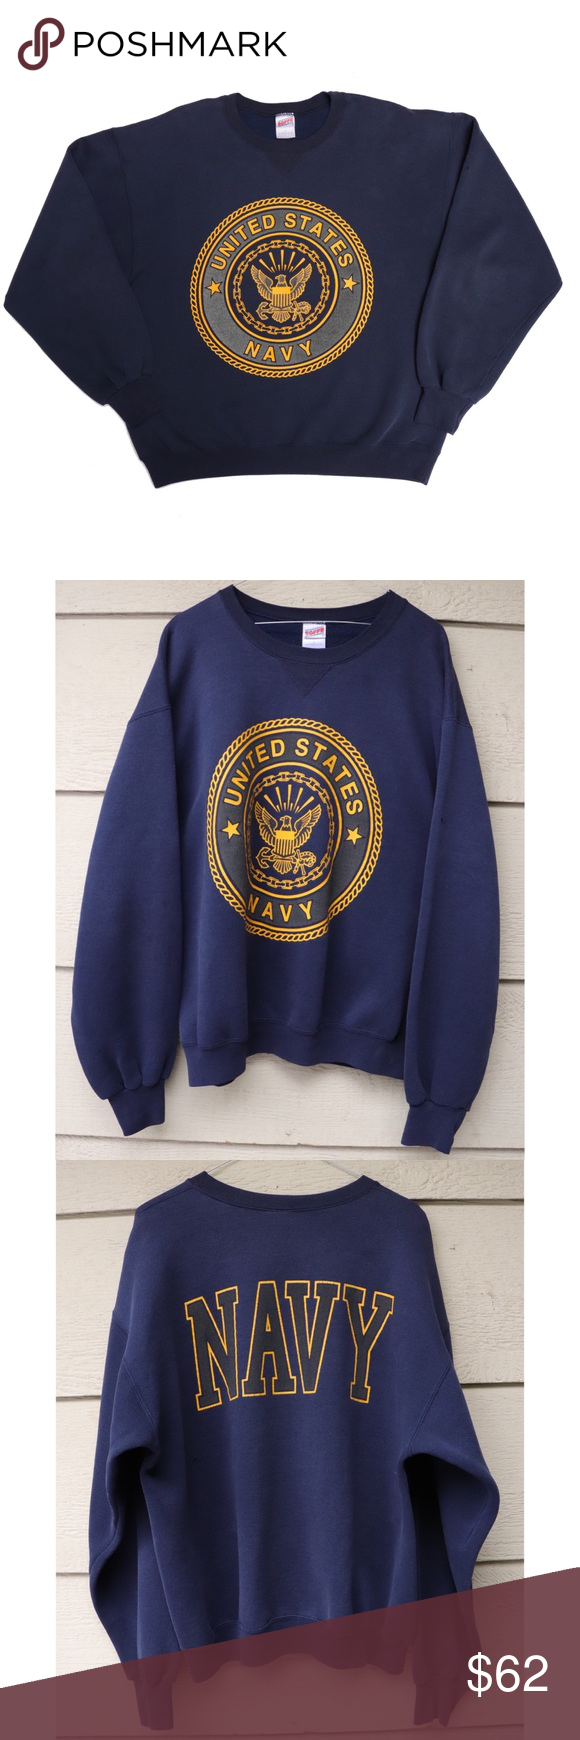 Vintage Us Navy 3m Reflective Pullover Crewneck Clothes Design Pullover Sweatshirt Shirt [ 1740 x 580 Pixel ]